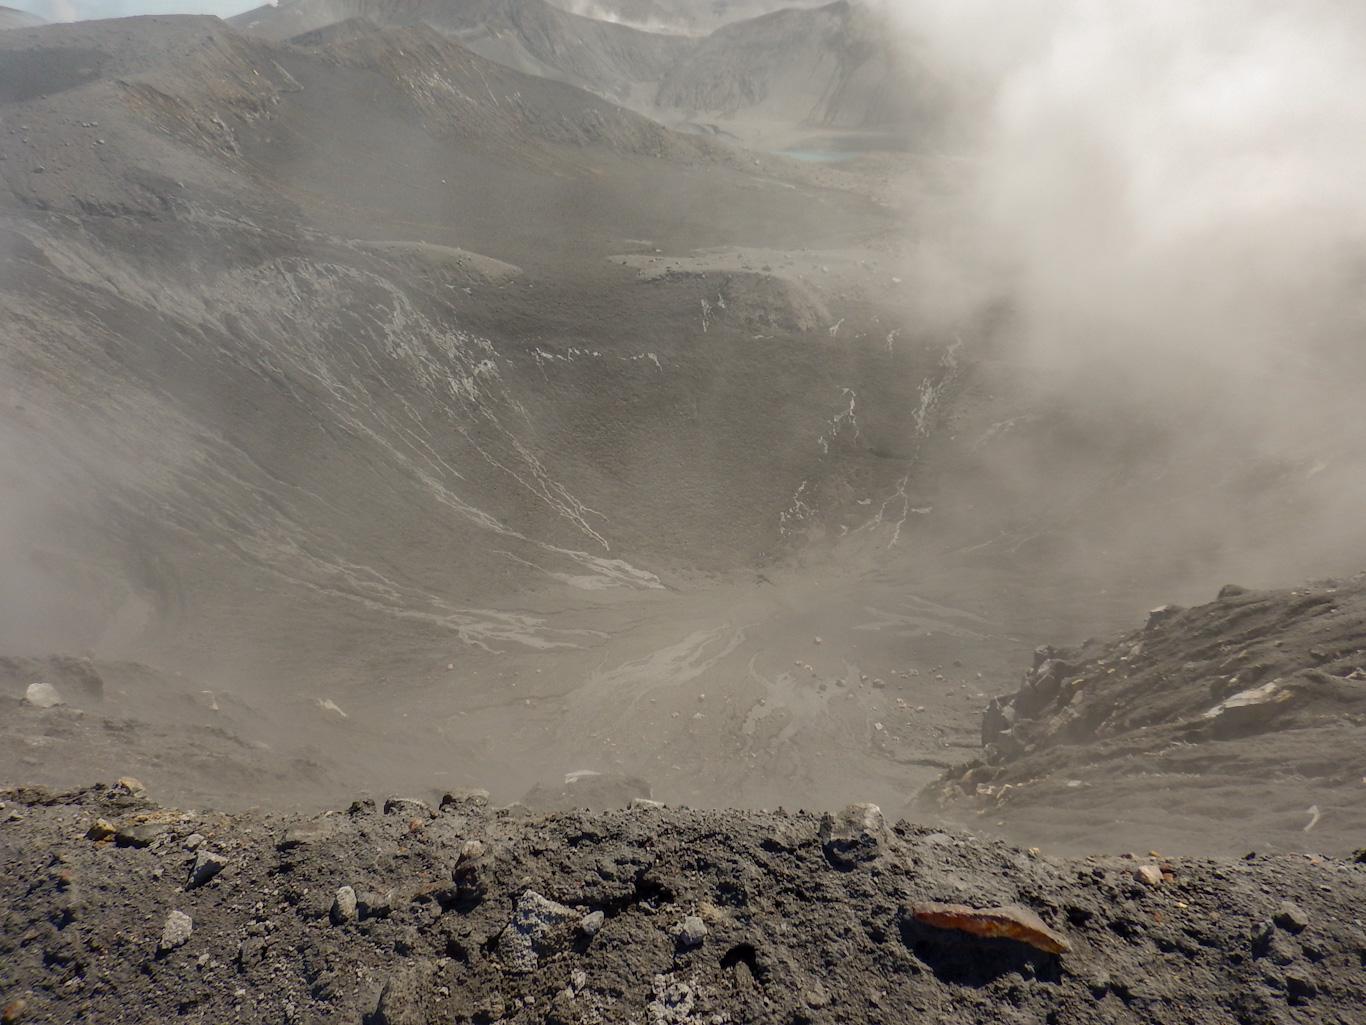 кратер вулкана Эбеко